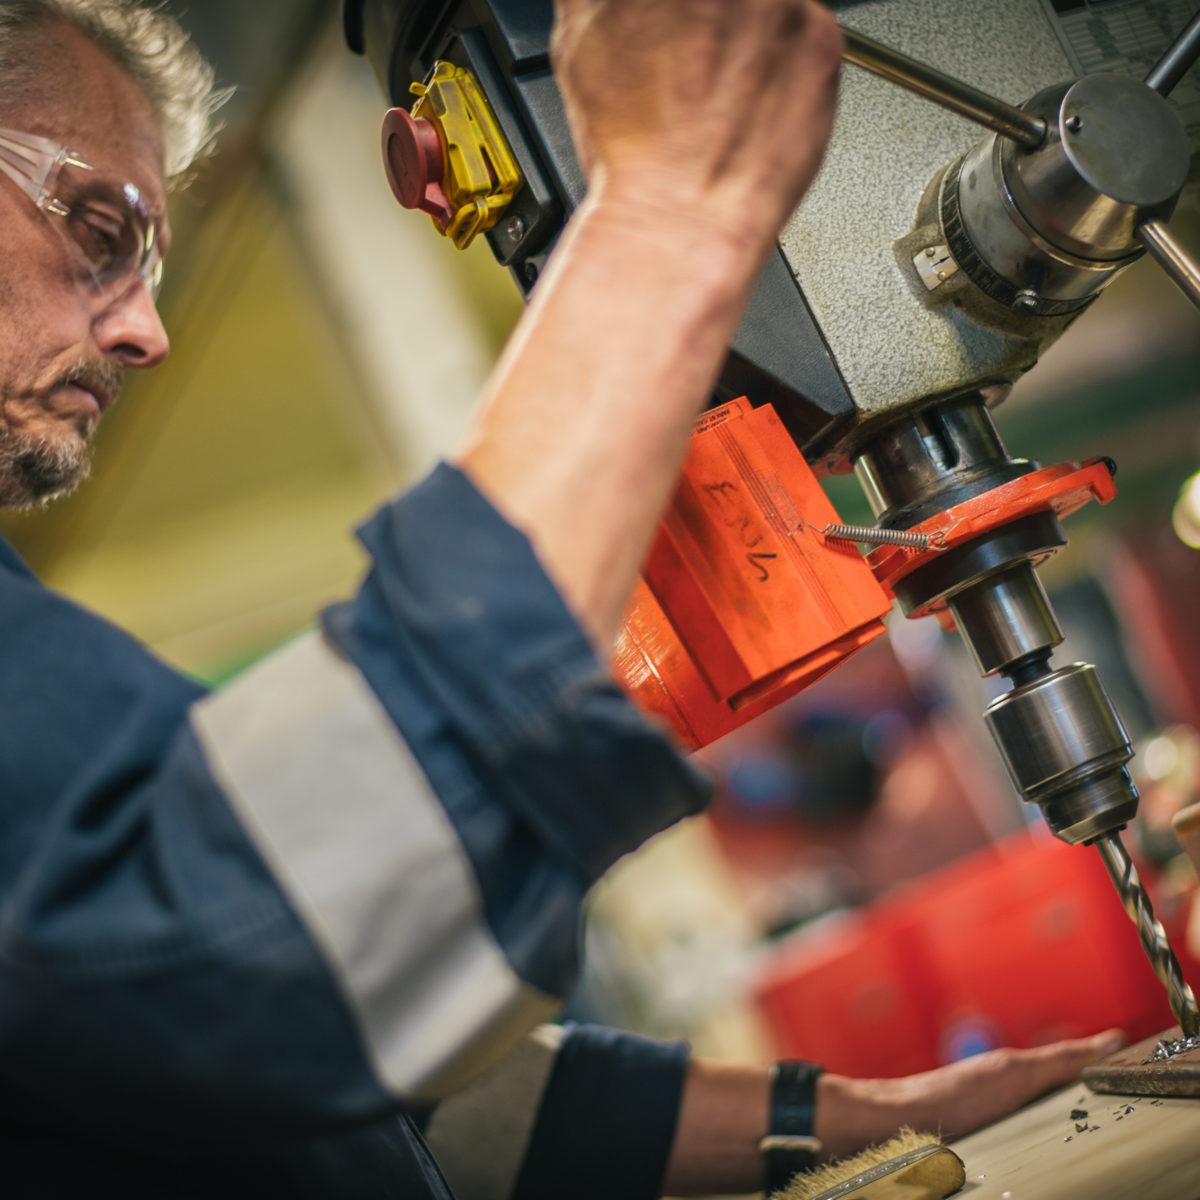 Pendennis shipyard staff photos 2014 (6)